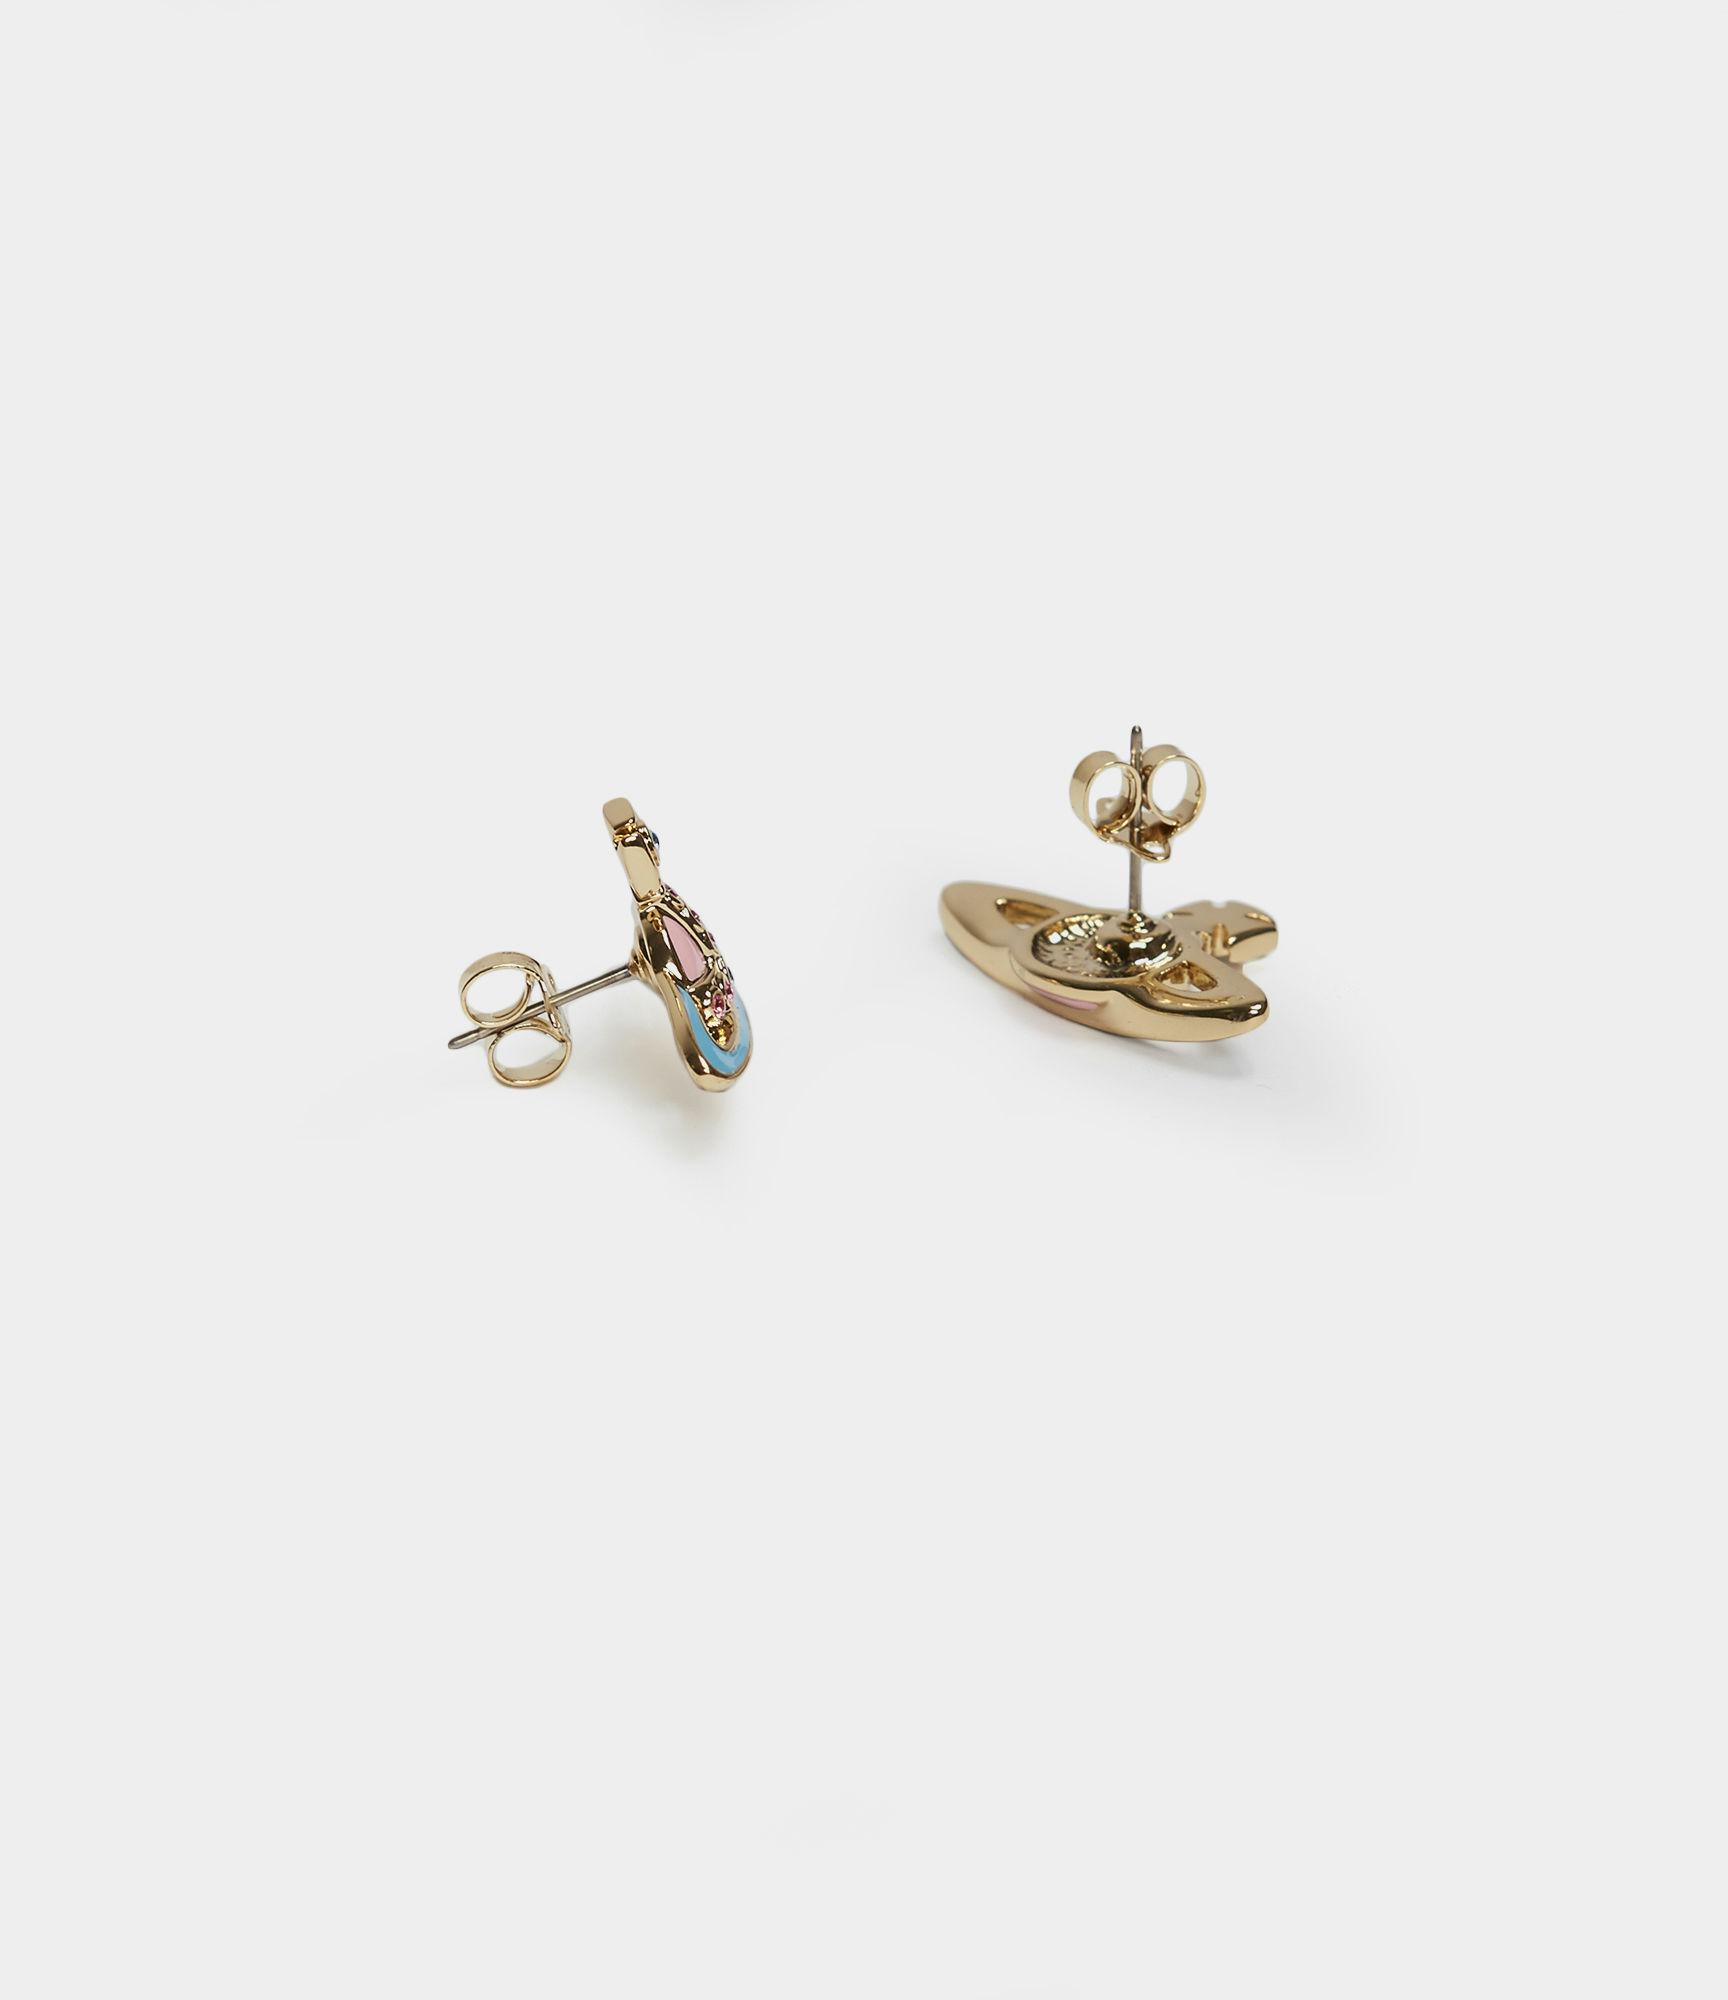 e12e03749 Vivienne Westwood - Metallic Small Neo Bas Relief Earrings - Lyst. View  fullscreen